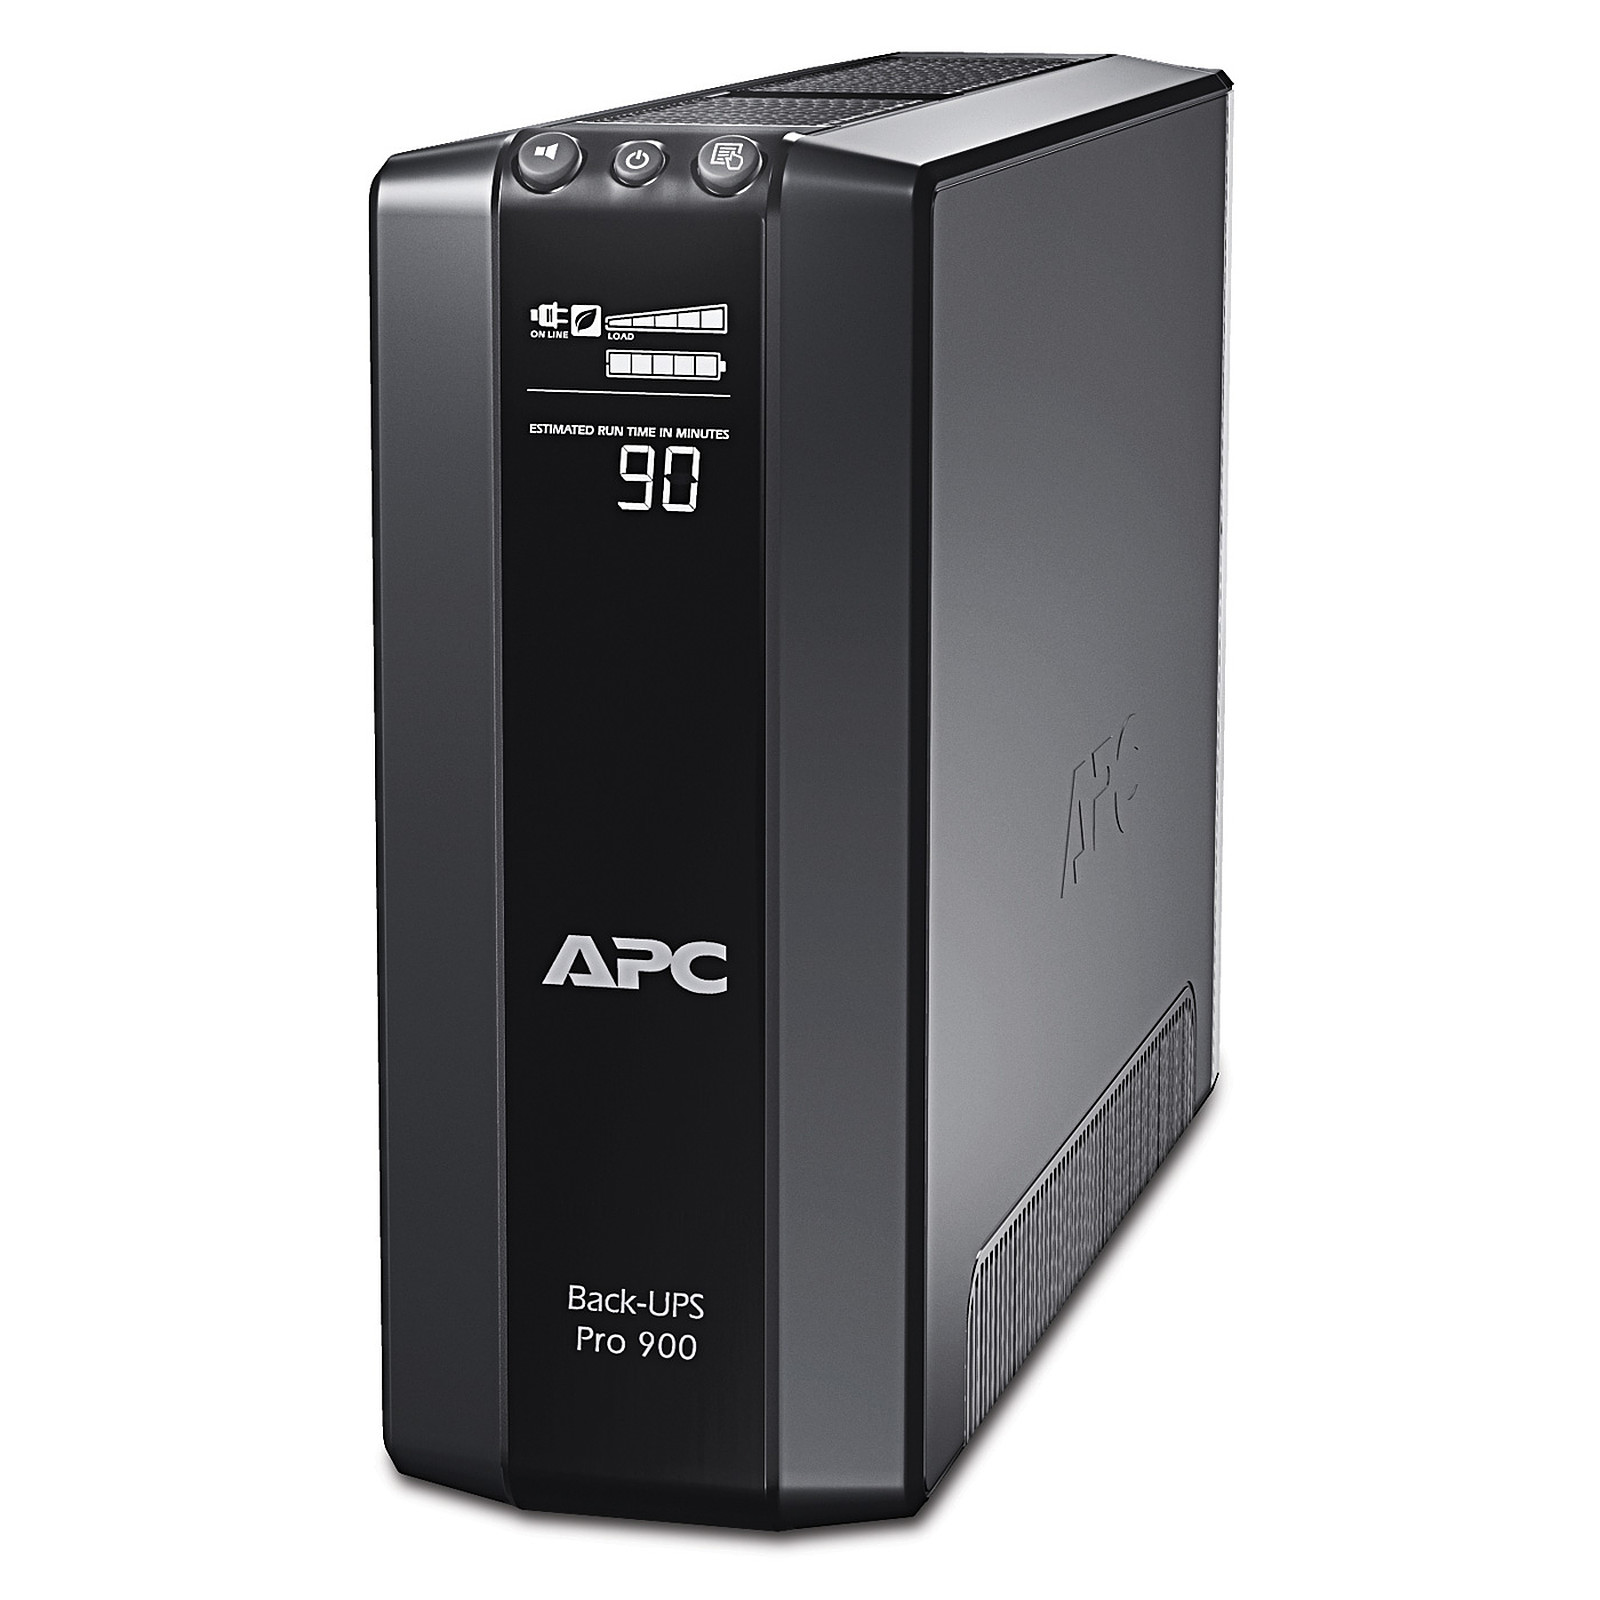 APC Back-UPS Pro 900G